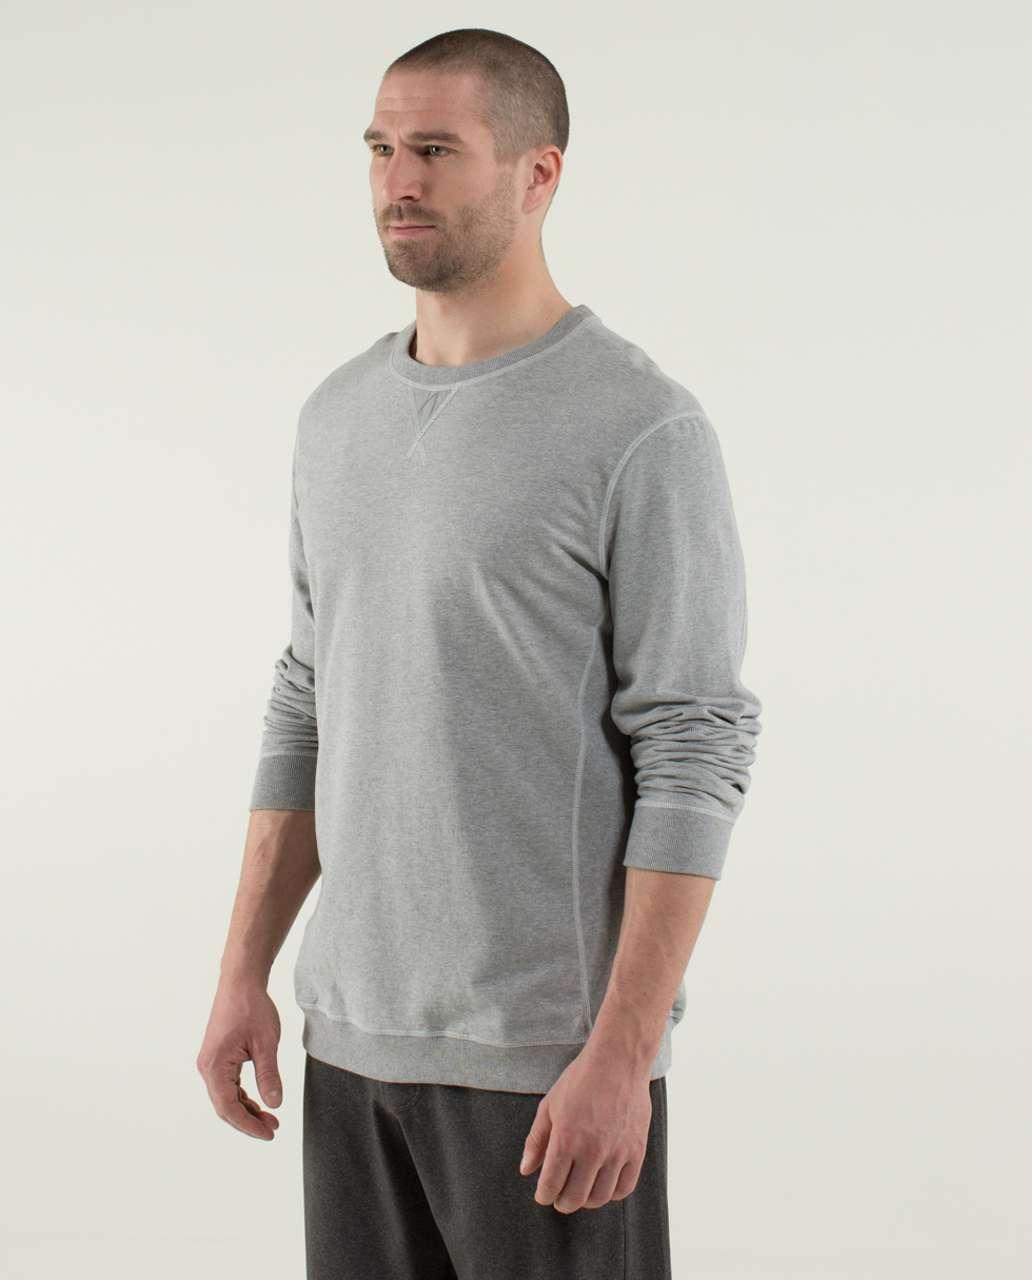 Lululemon All Town Crew Long Sleeve - Heathered Medium Grey / Ambient Grey